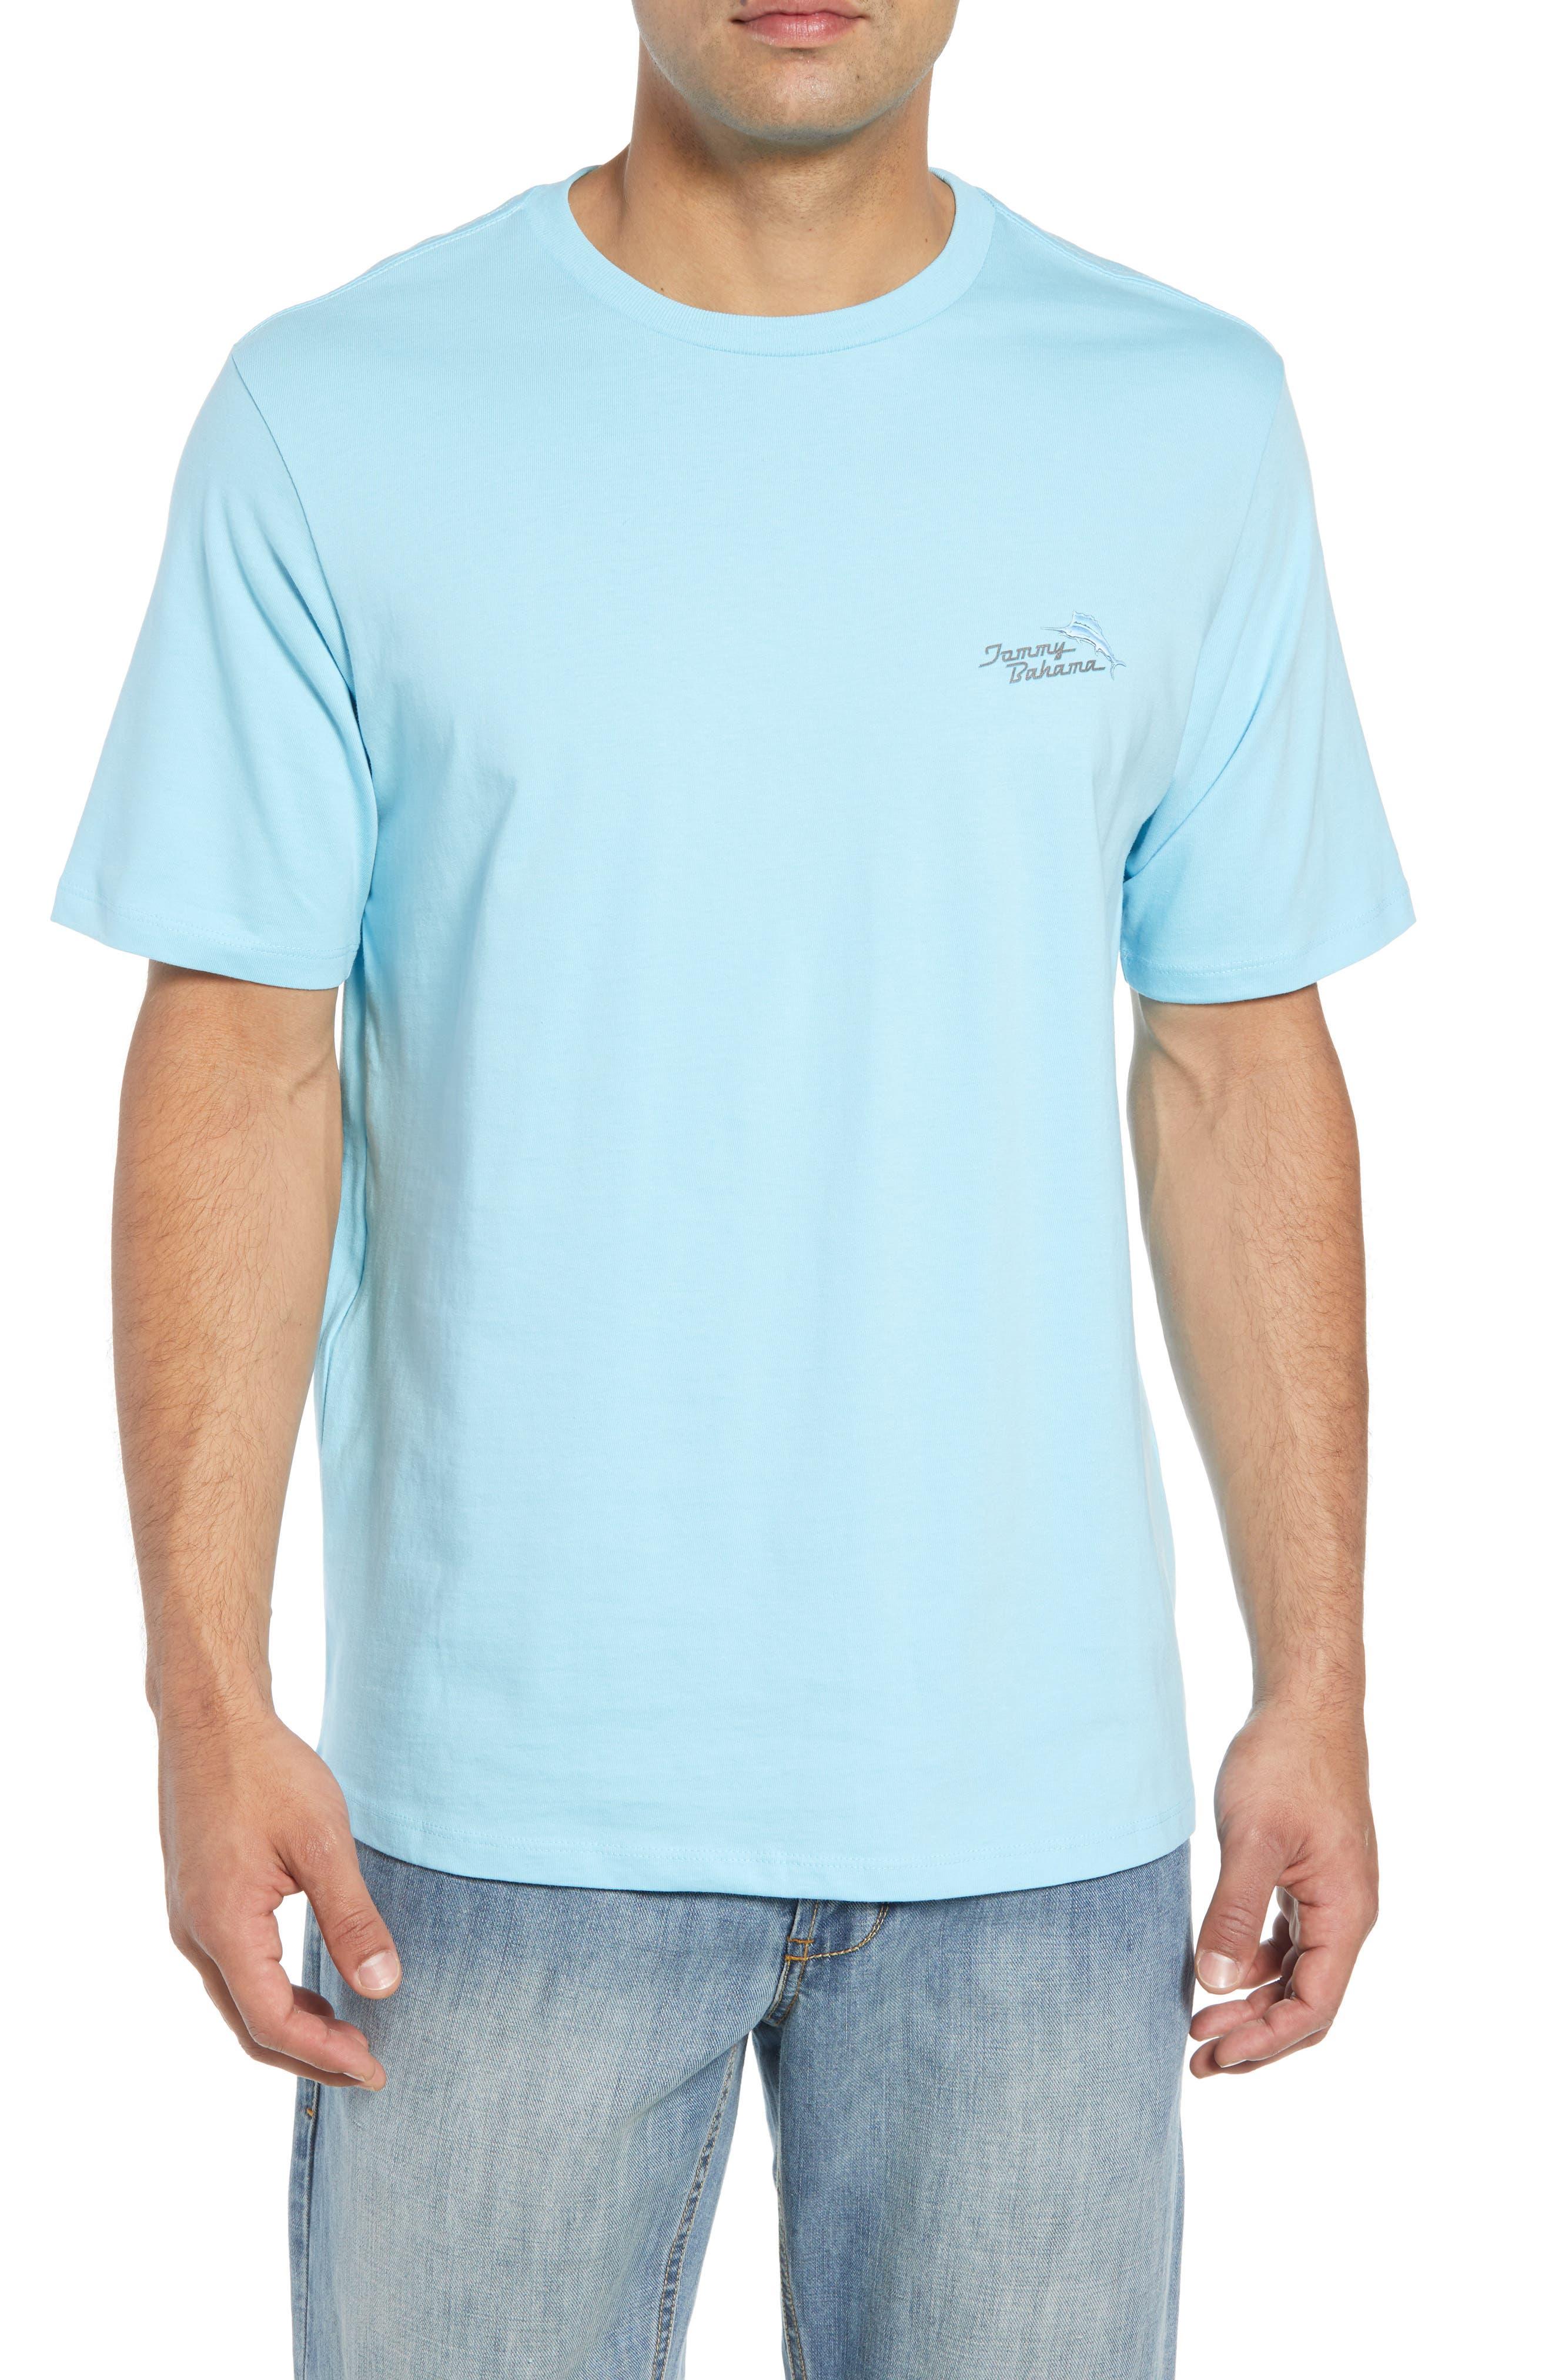 Beach Grille T-Shirt,                             Main thumbnail 1, color,                             400